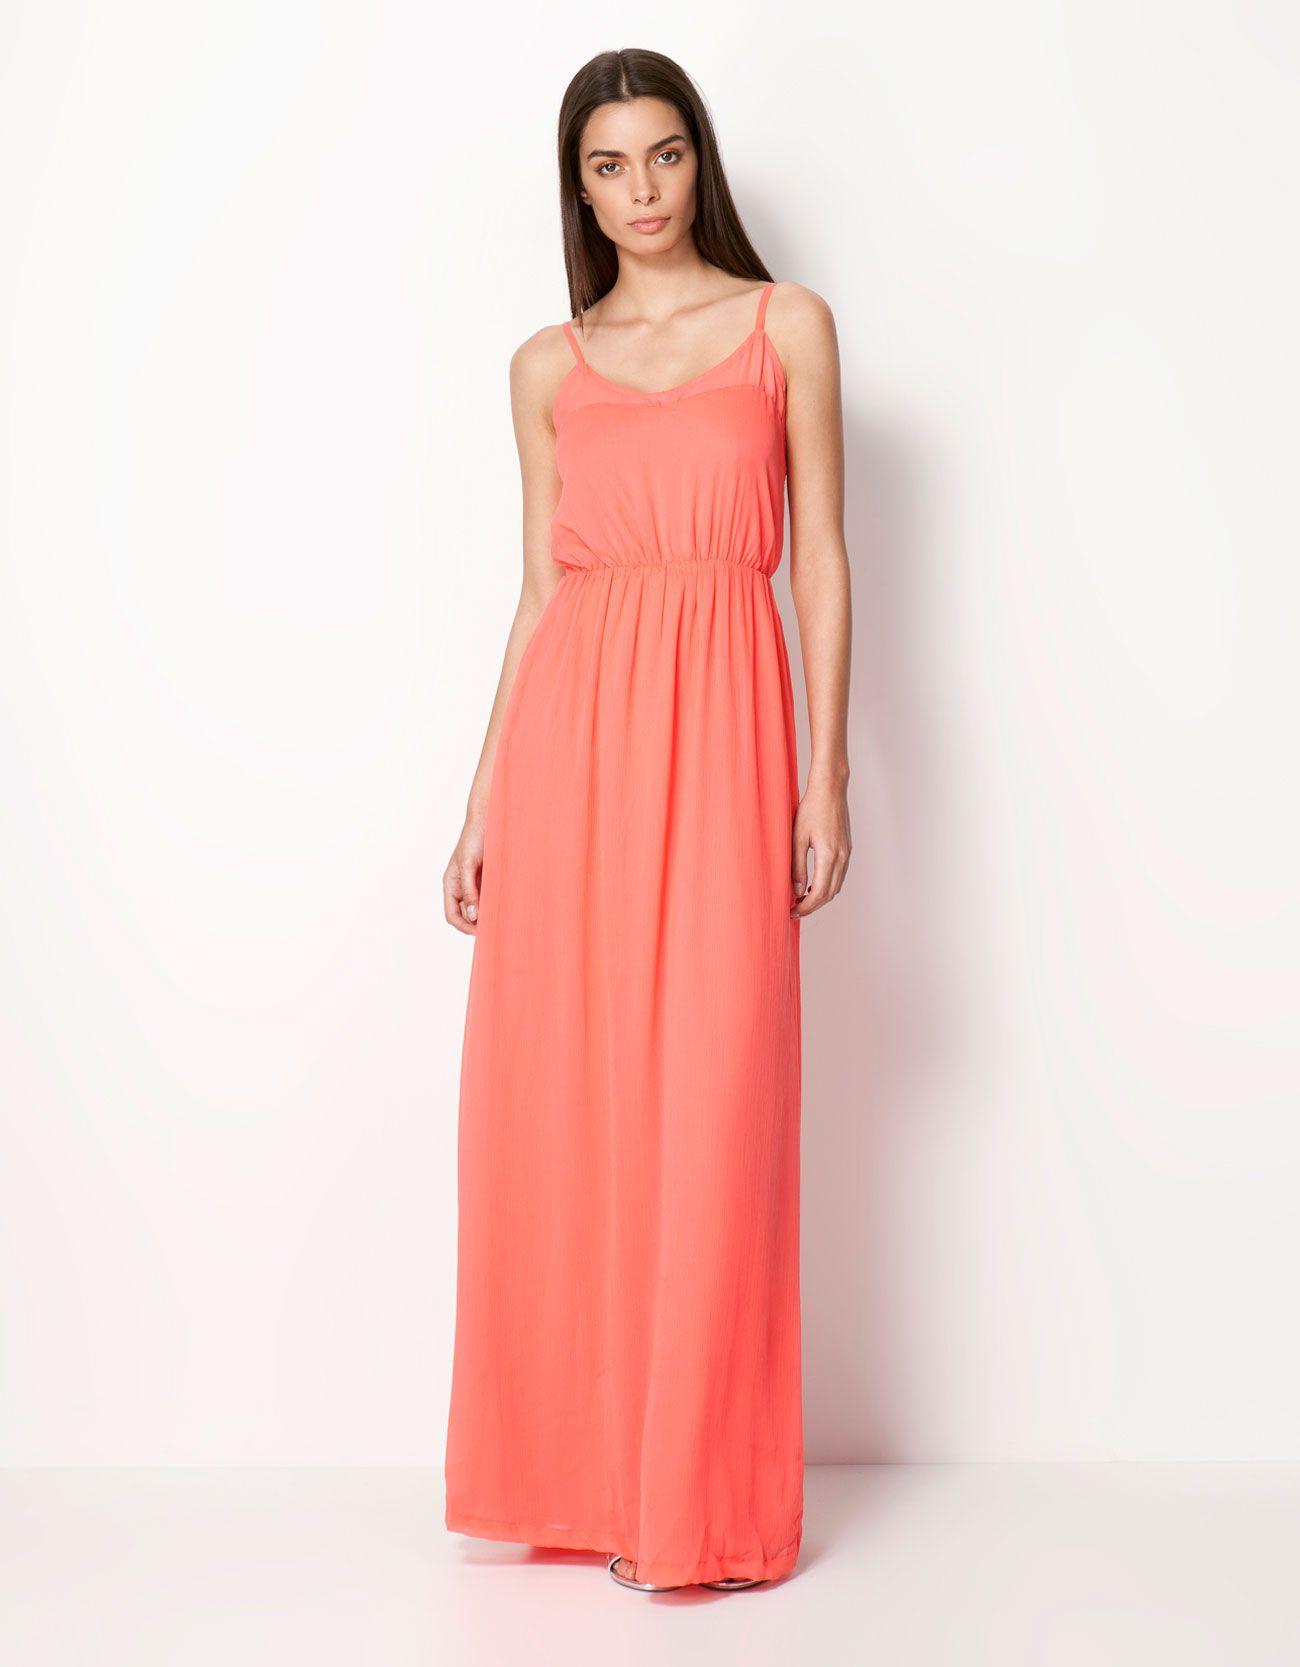 34c357ee262 Bershka Serbia - Bershka long dress